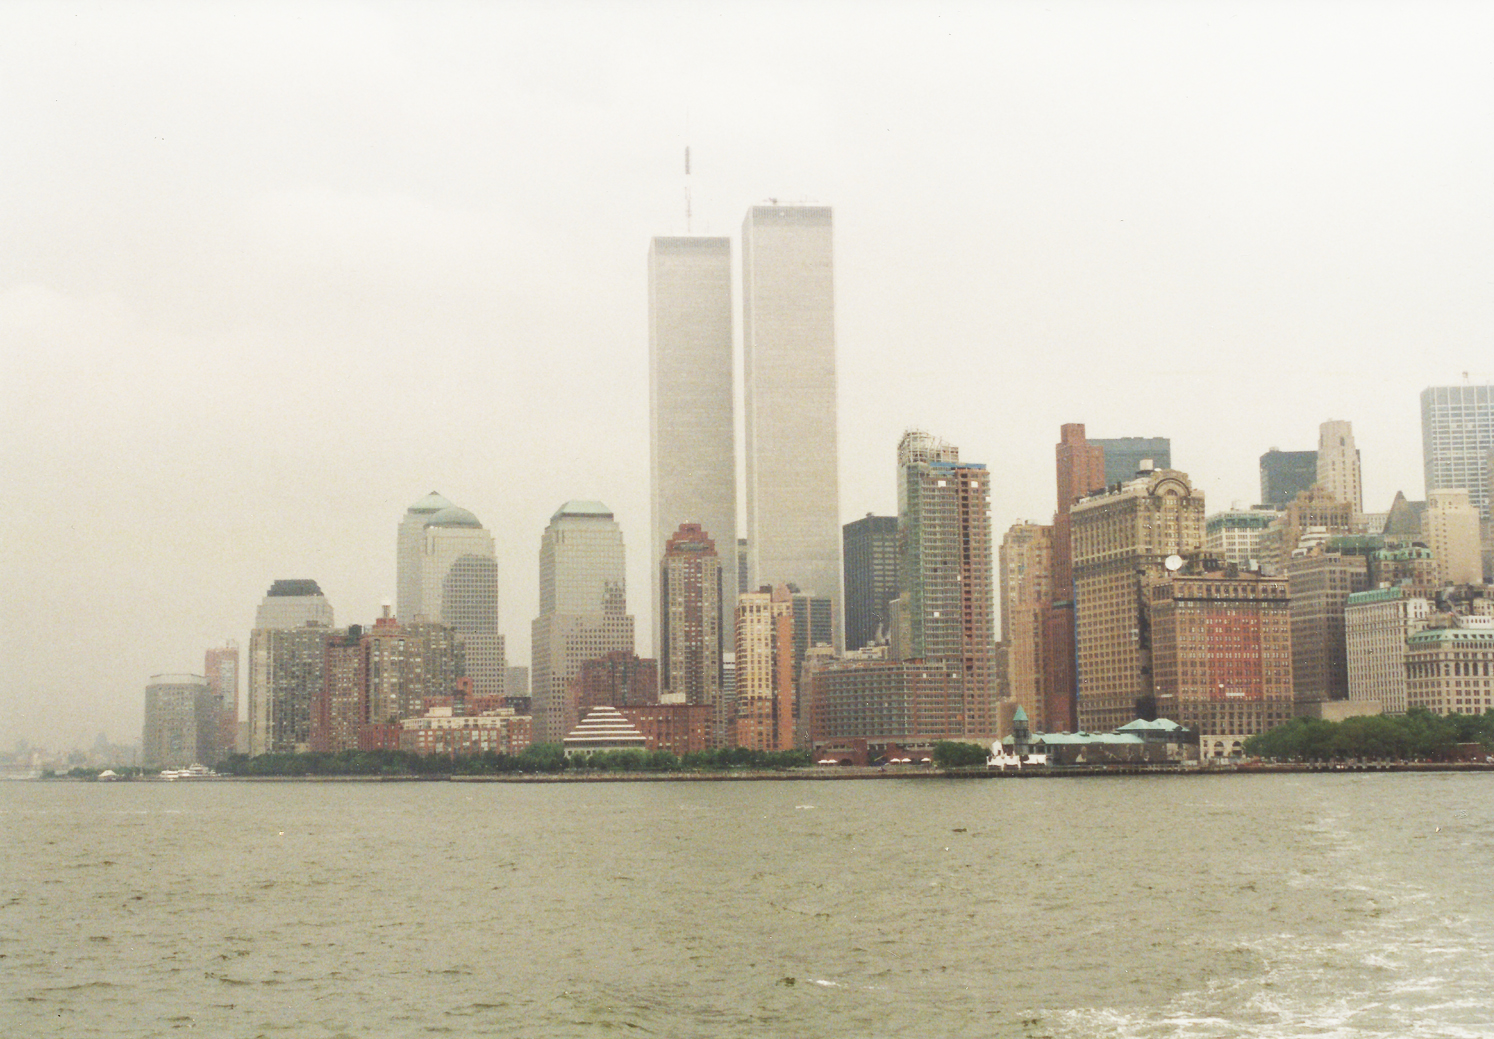 Skyline New York 2001